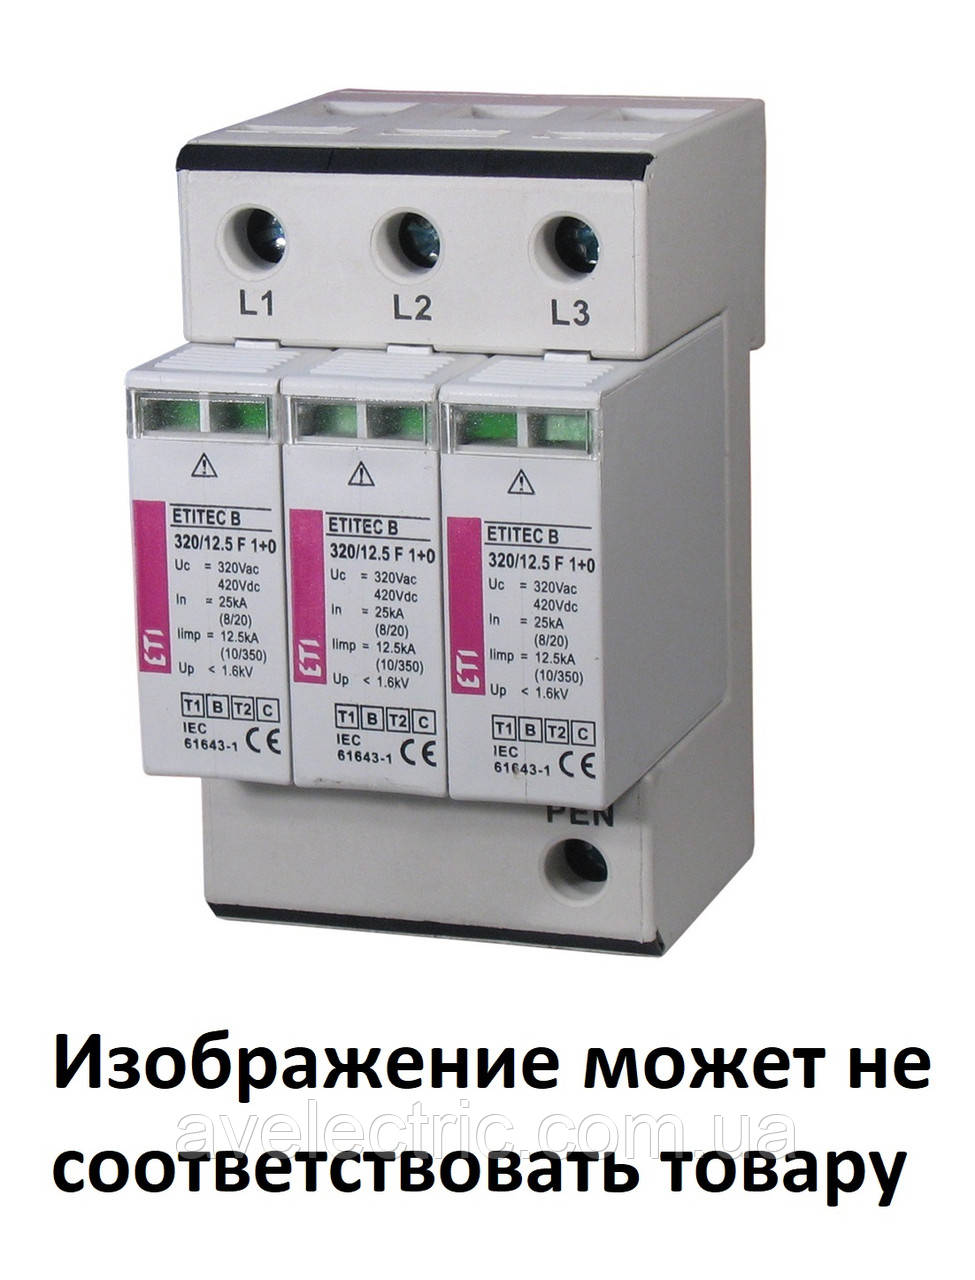 Обмежувач перенапруги ETITEC V T12 280/12,5 (3+0) RC